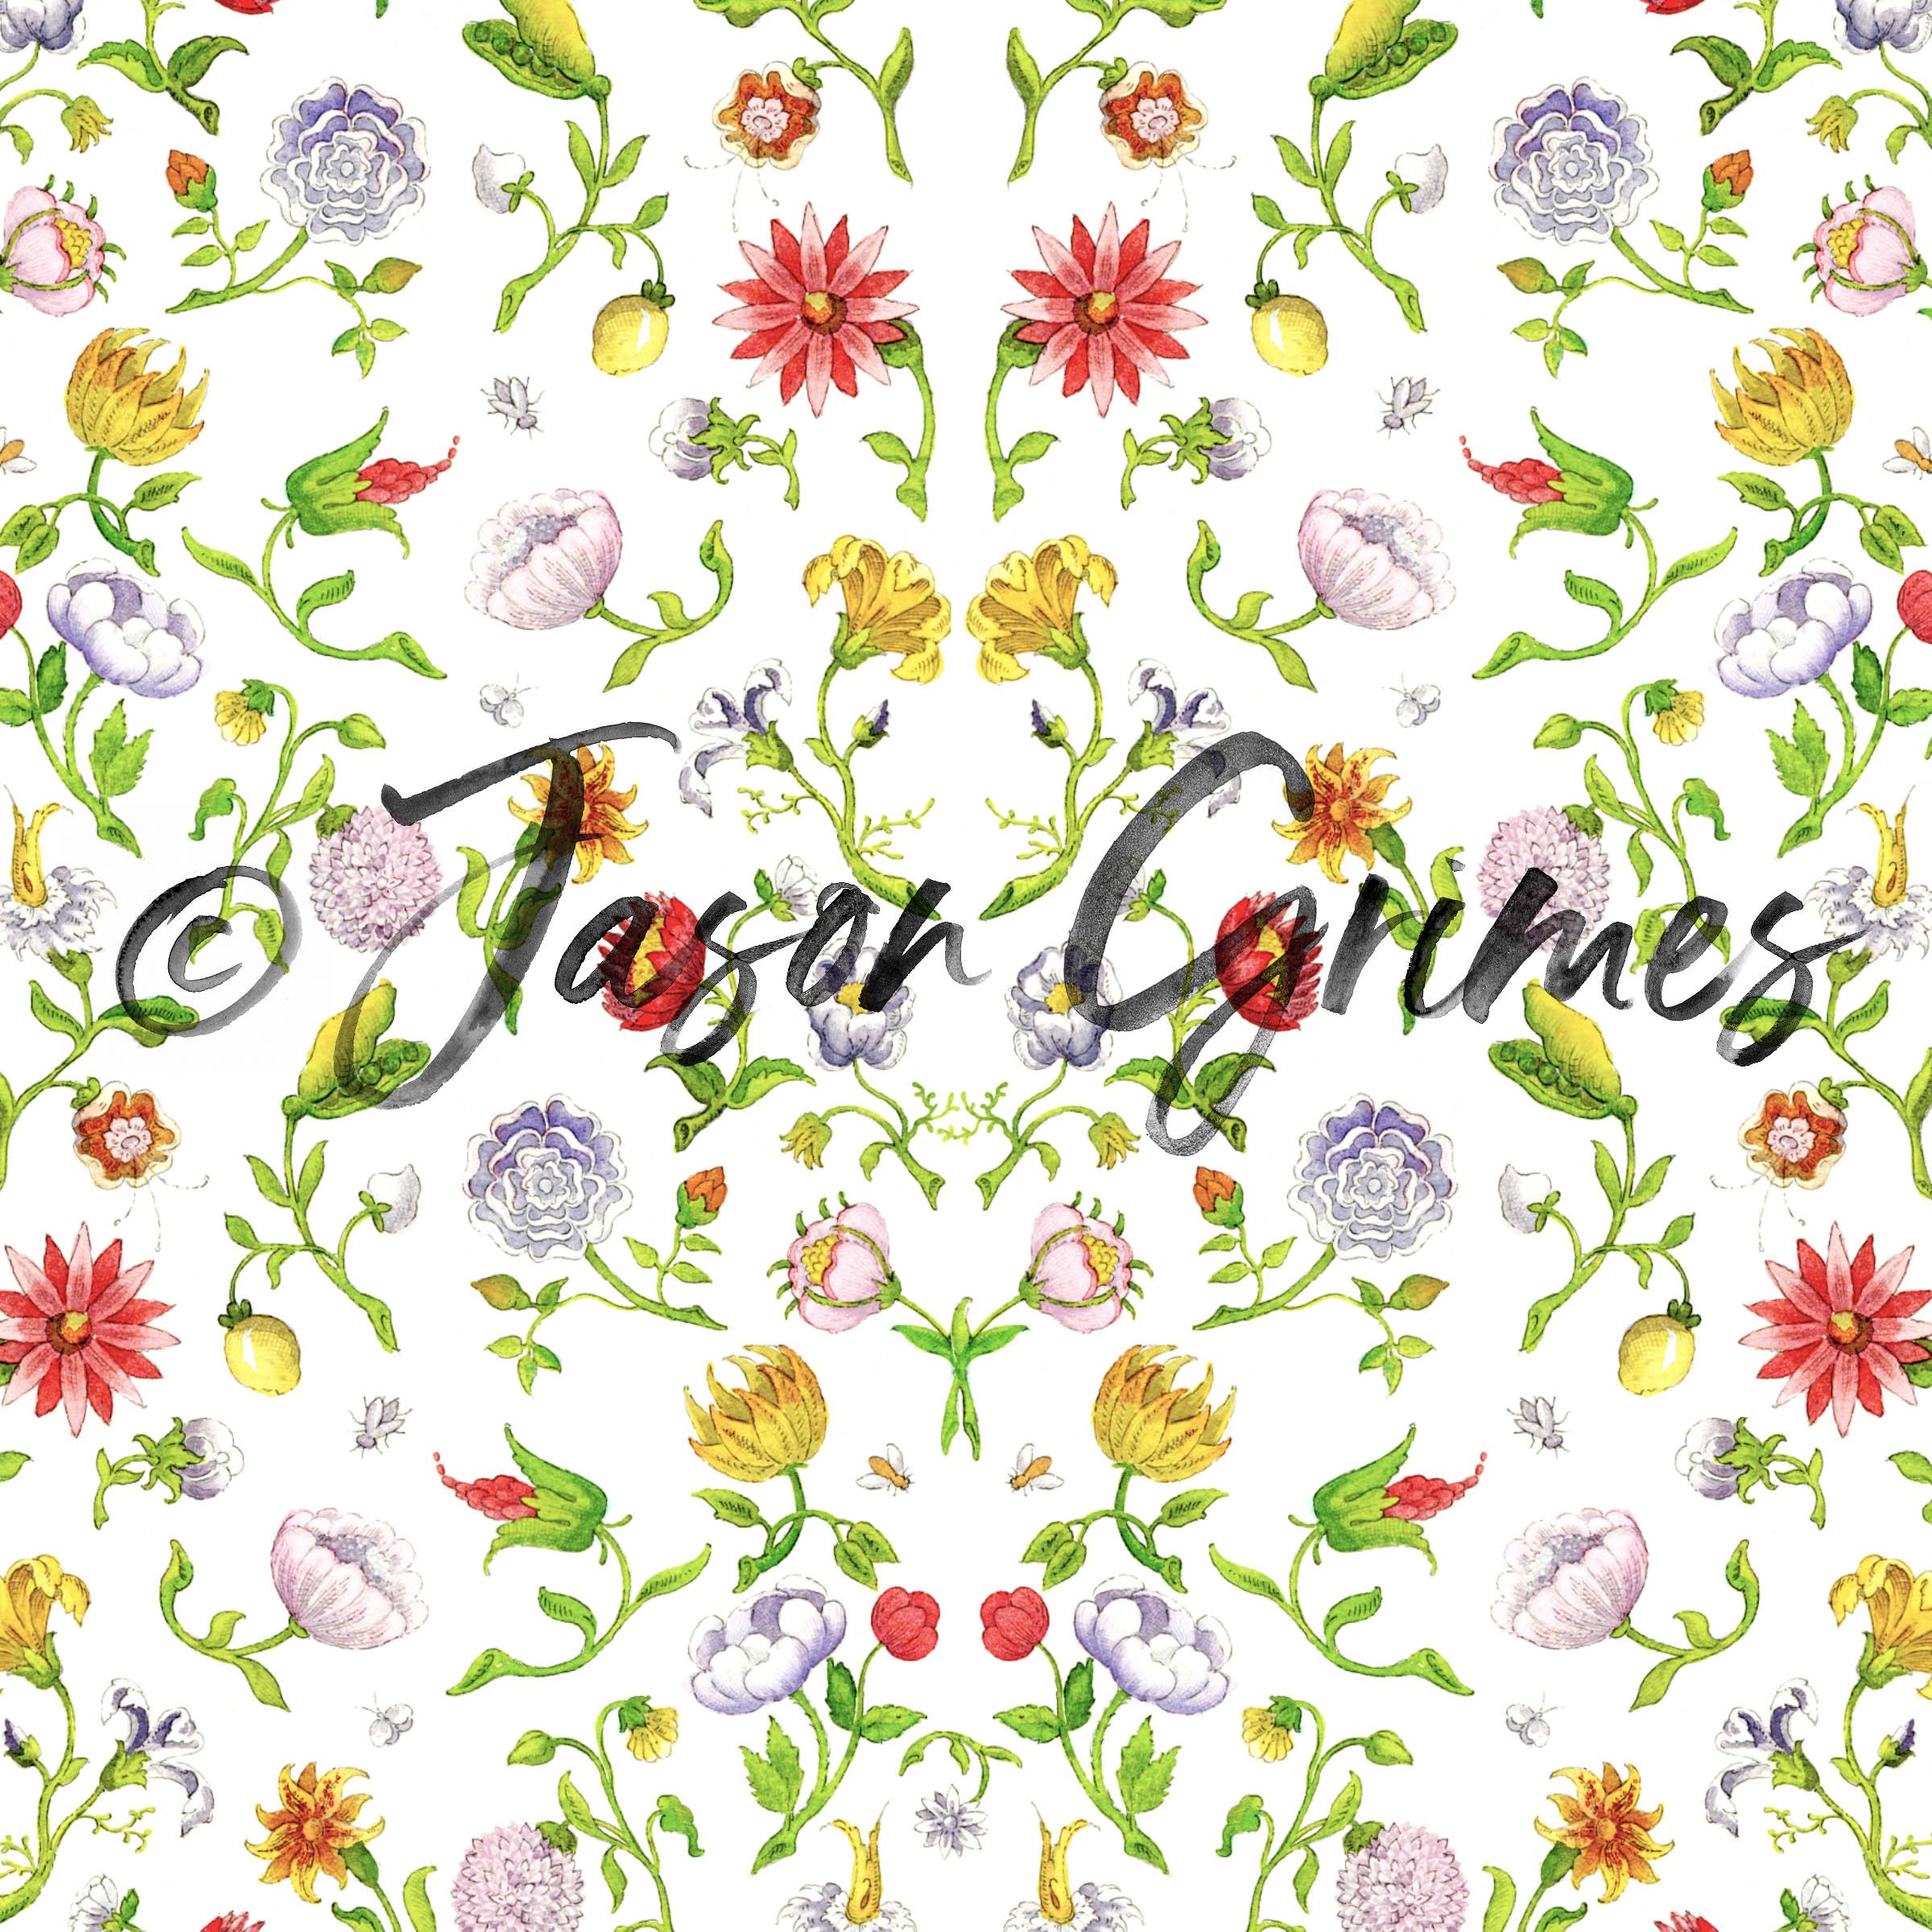 Cut Flowers - full color